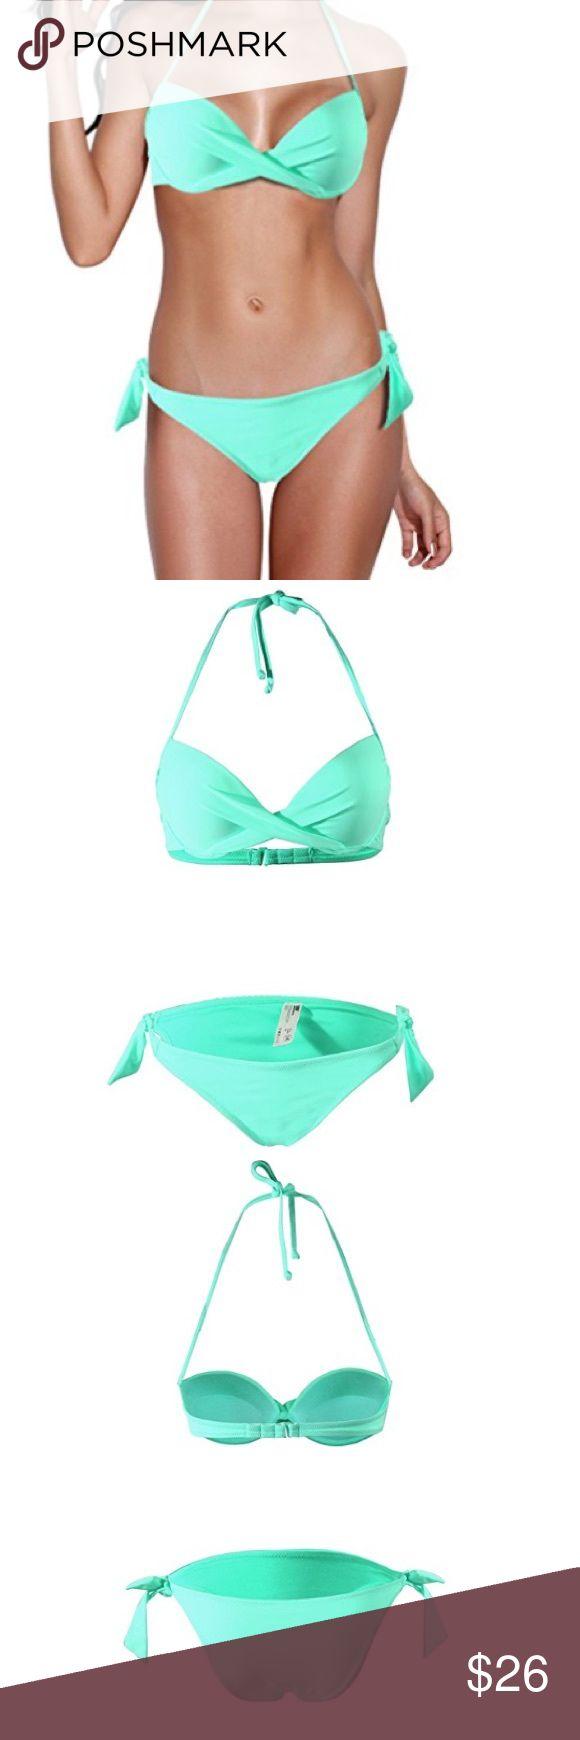 Light turquoise push up bikini. Padded cups with perfect cleavage.  Bikini bottom with side ties. Perfect for full B to D cups komene swimwear Swim Bikinis